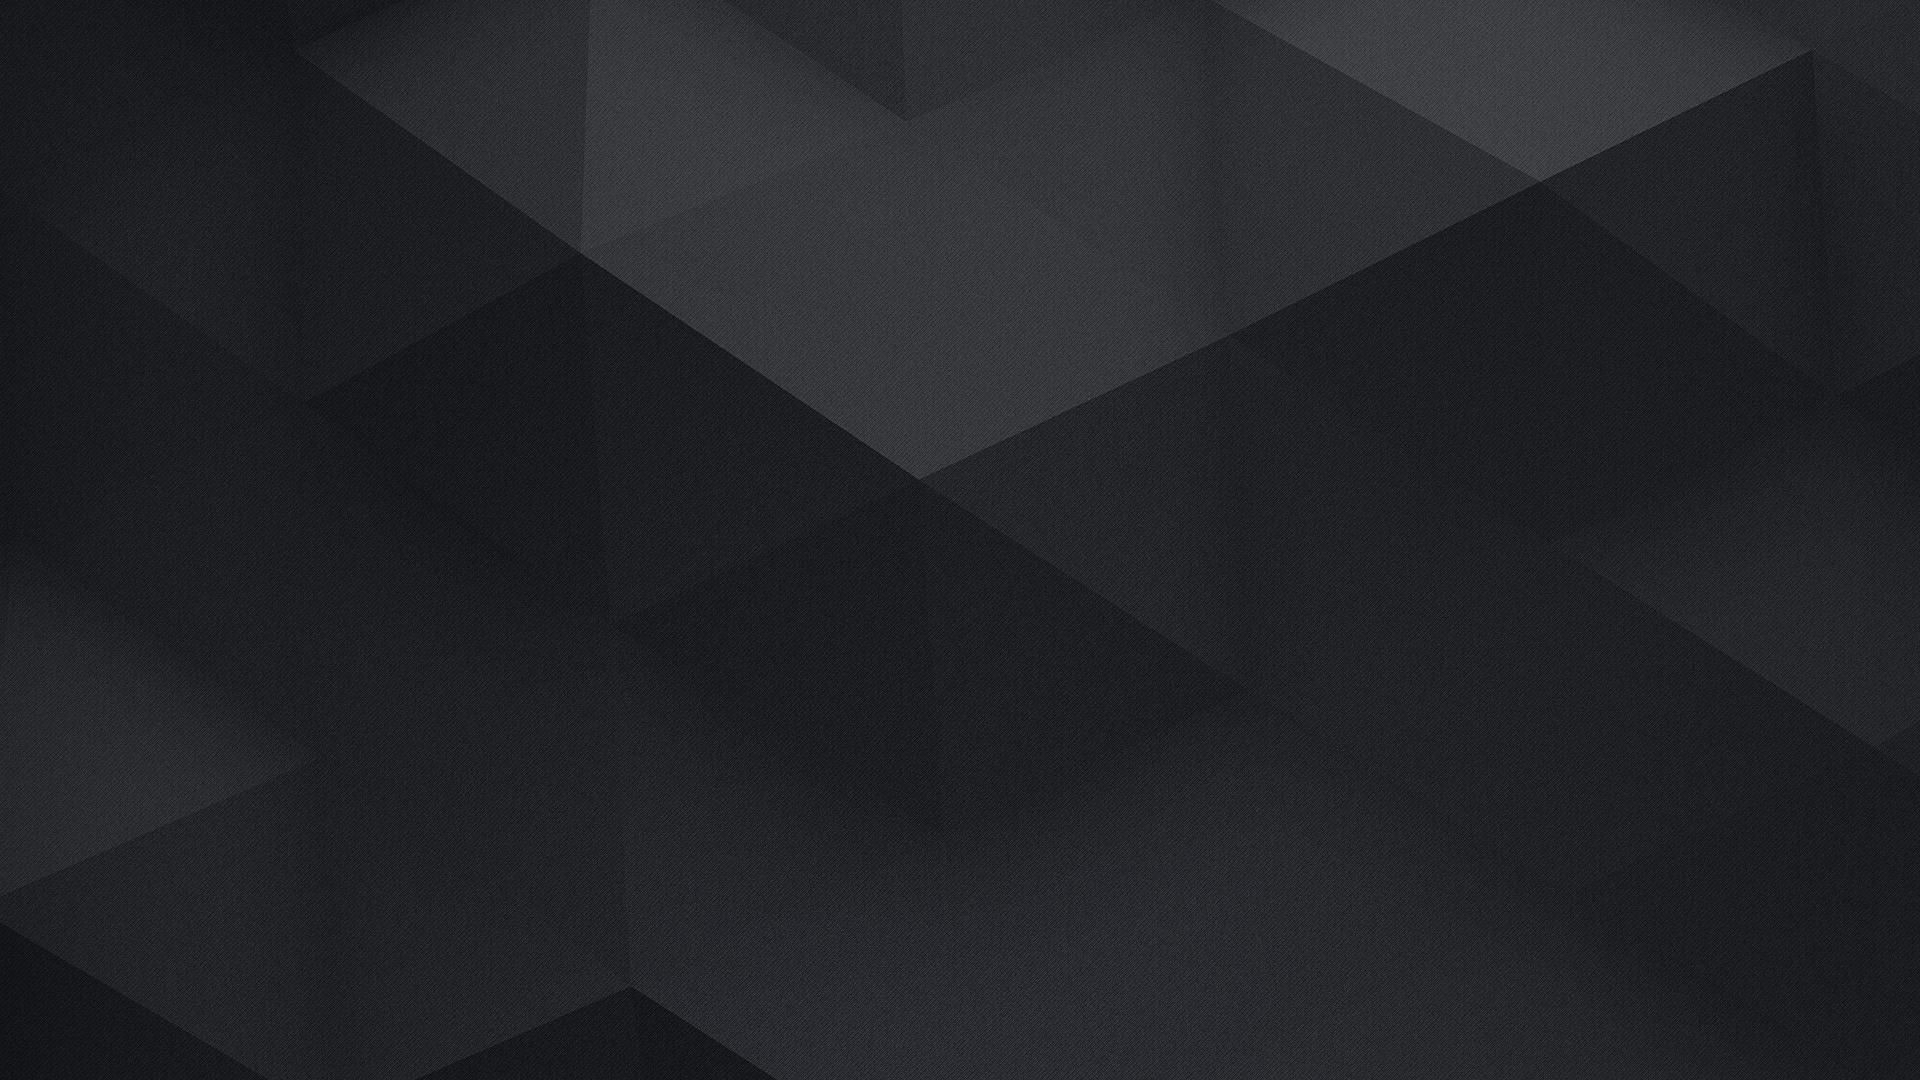 76 Geometric Desktop Wallpapers on WallpaperPlay 1920x1080